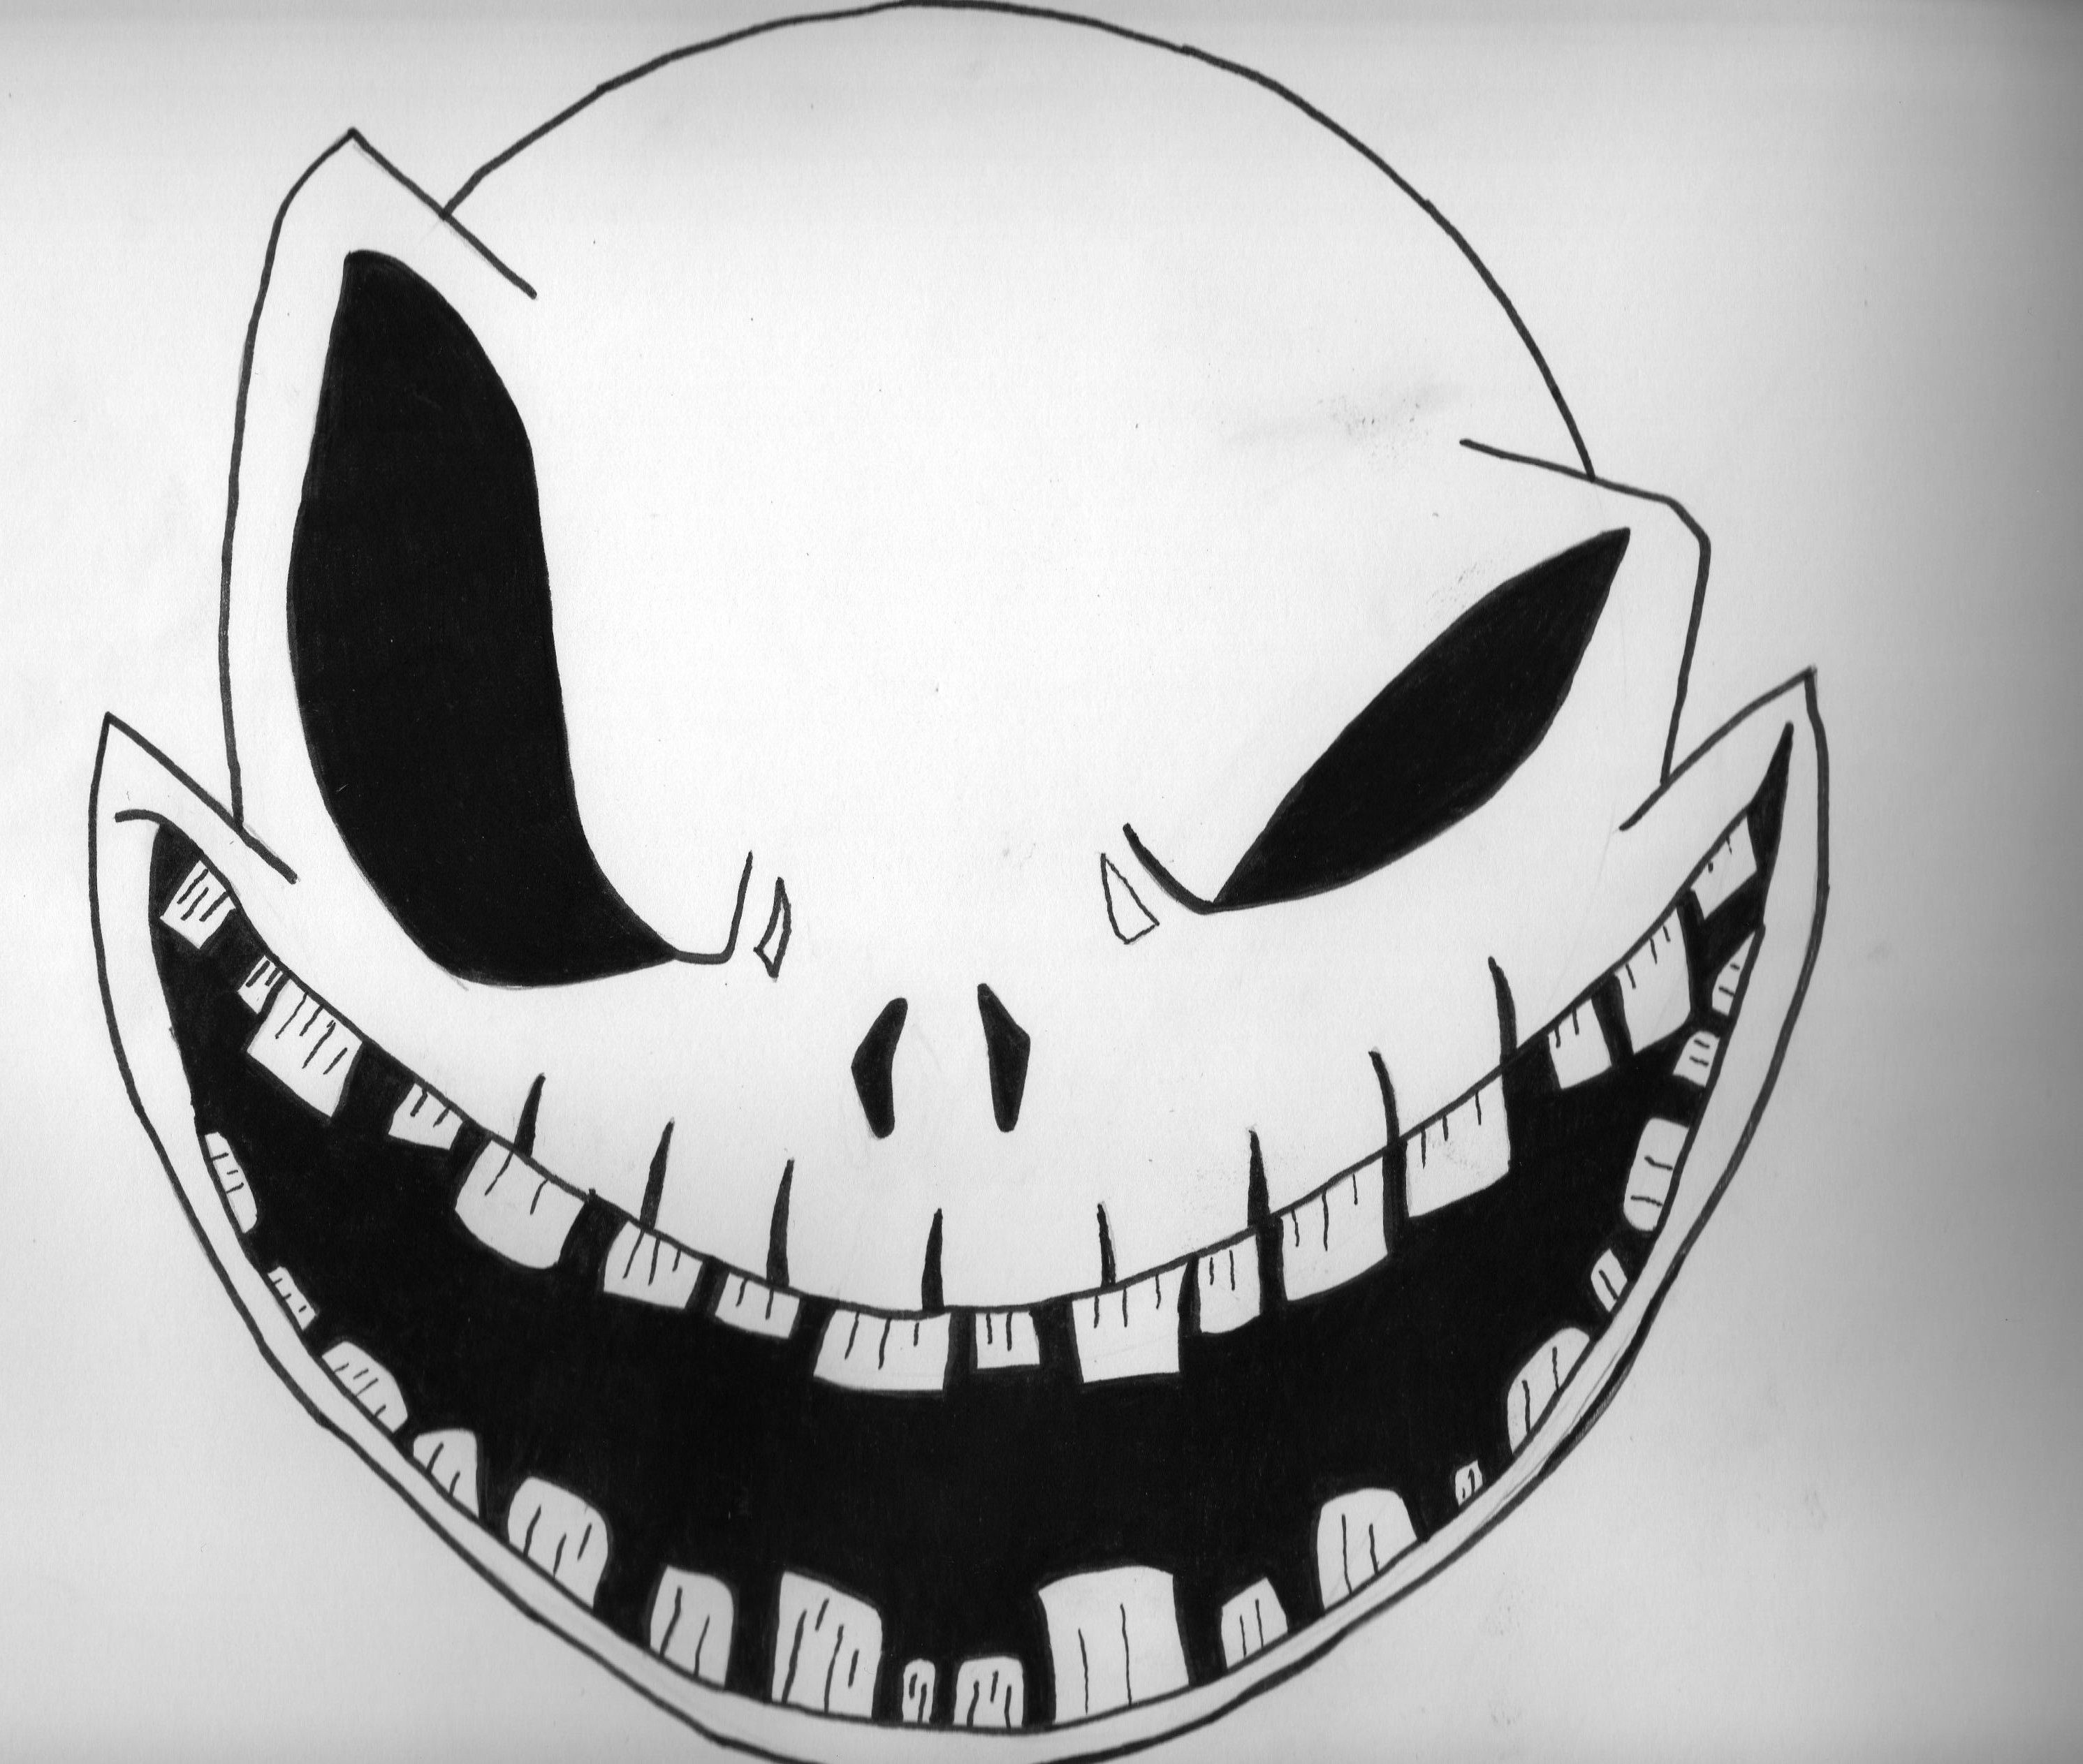 Scary Pumpkin Patterns Free Printable   Monster Face Pumpkin Stencil - Free Printable Scary Pumpkin Patterns